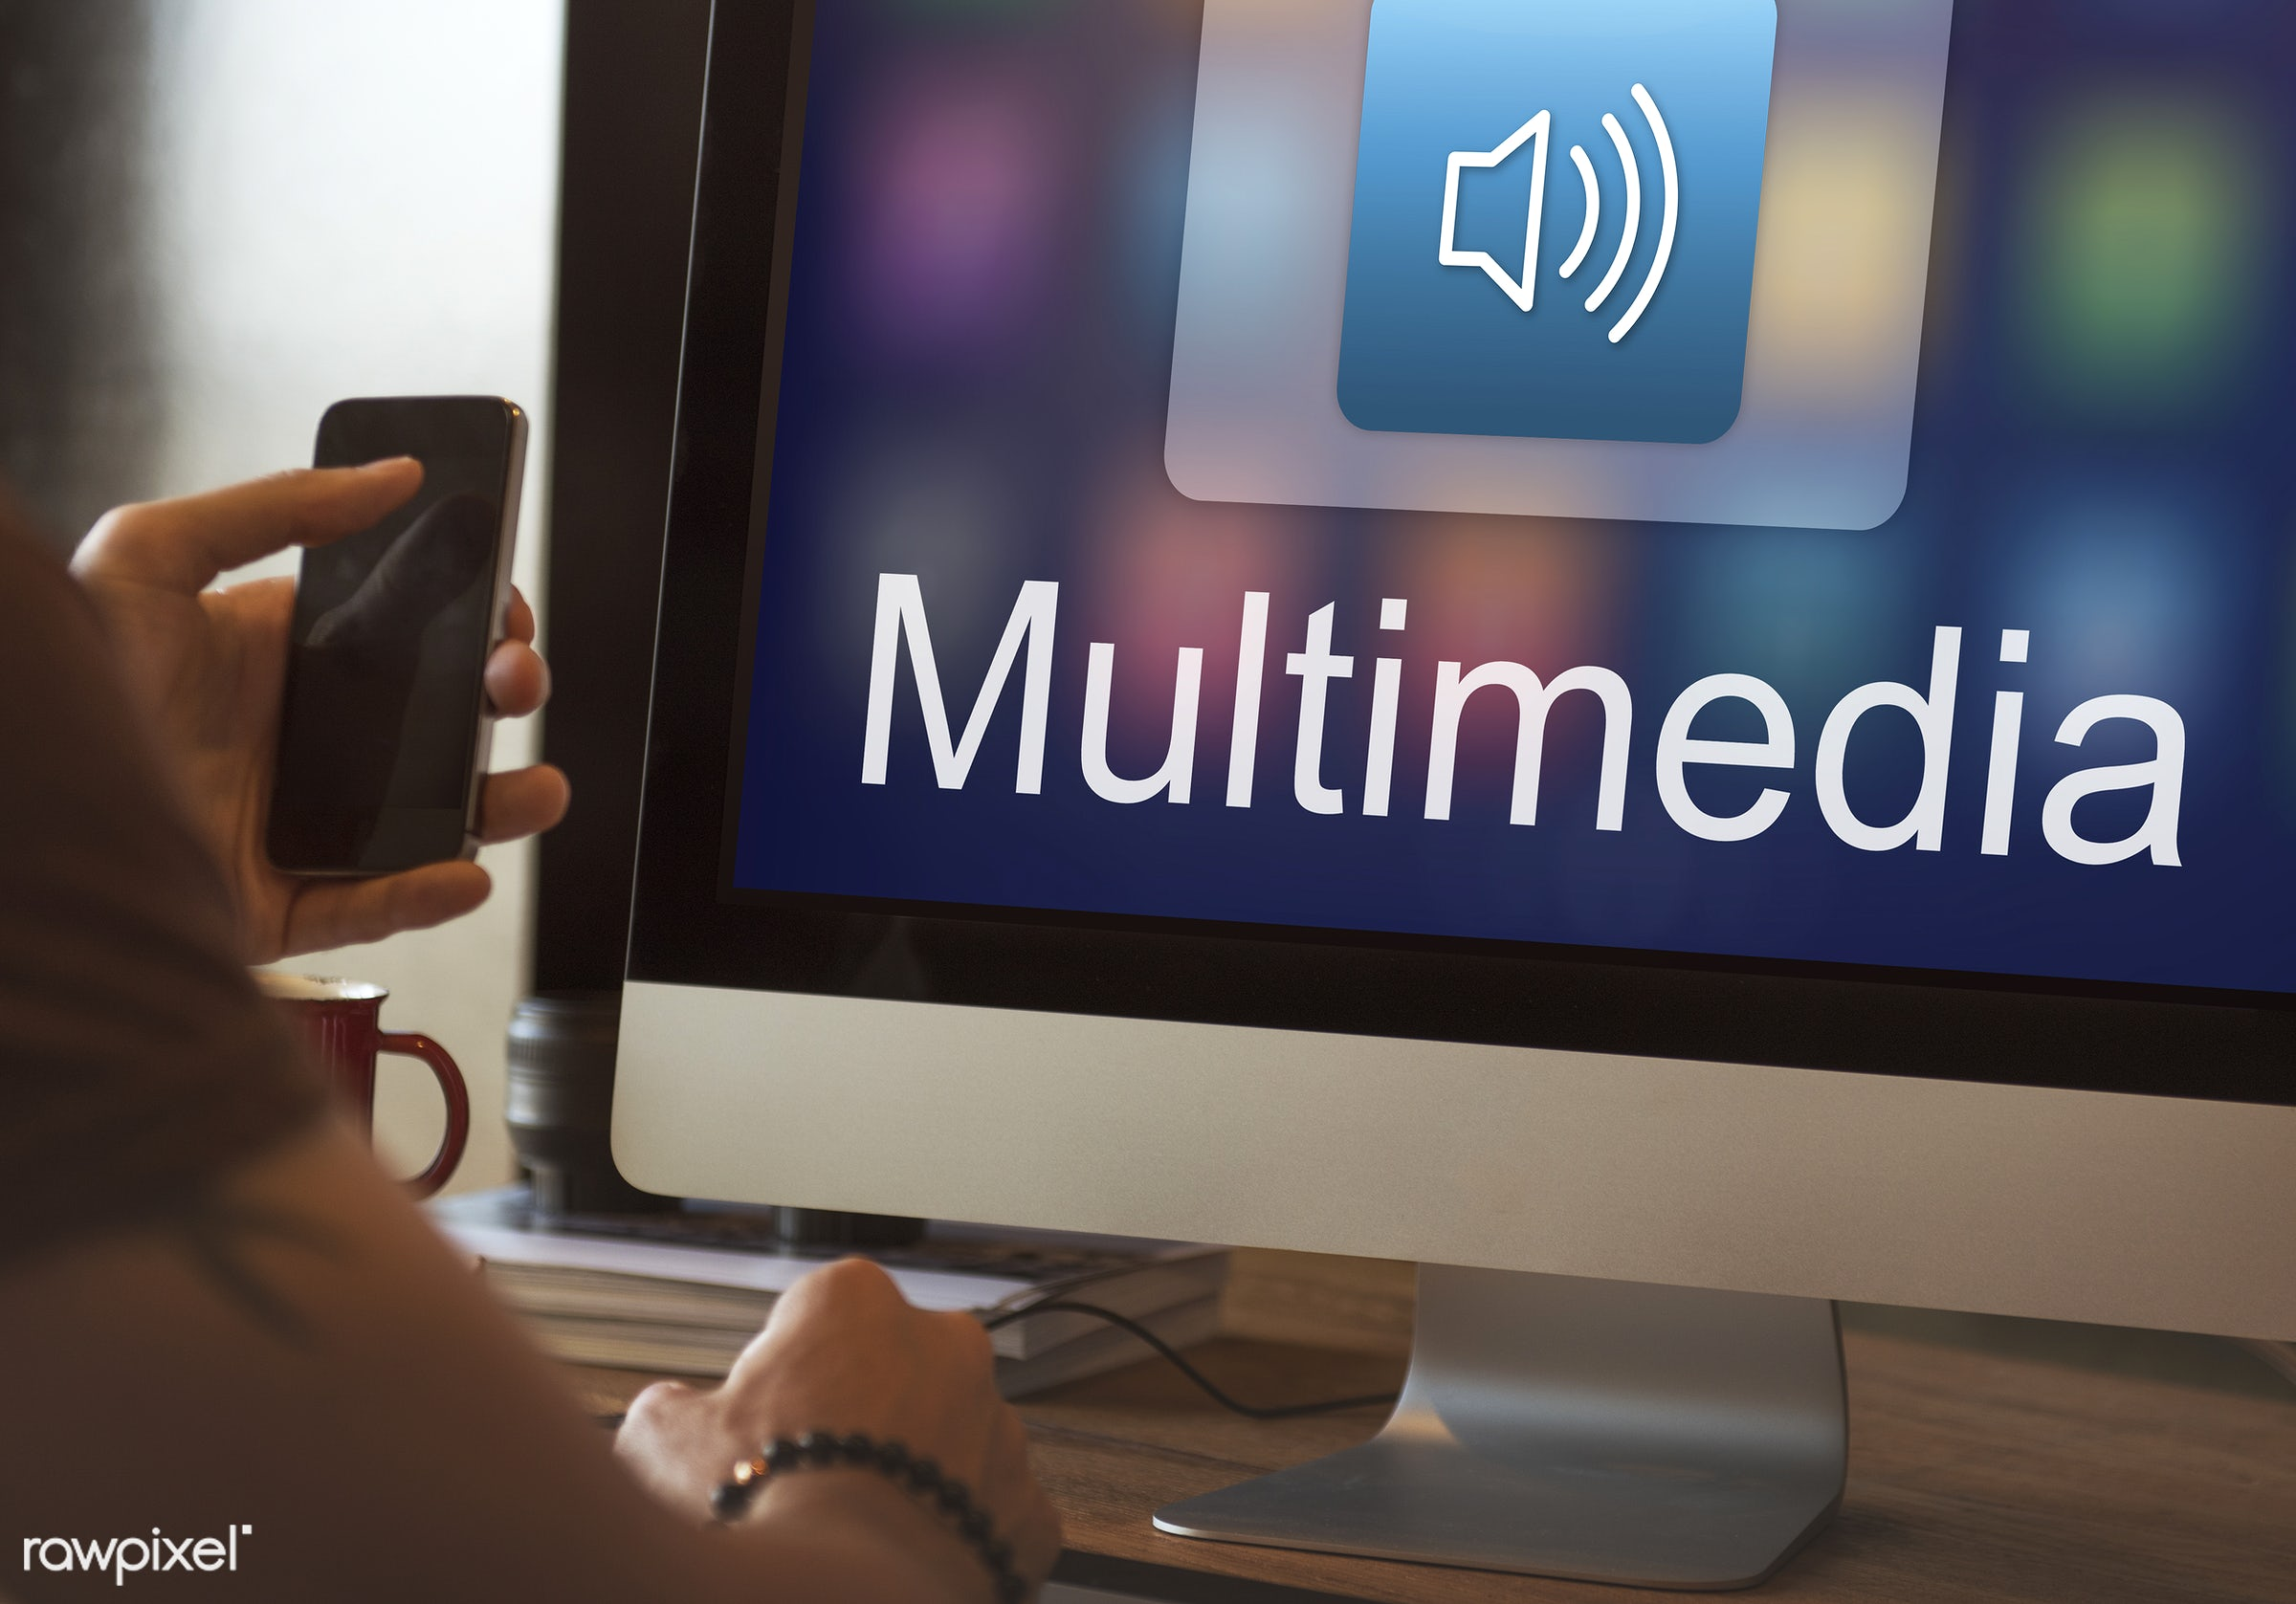 application, audio, blog, broadcast, browsing, communication, computer, connect, digital device, digital media, digital...